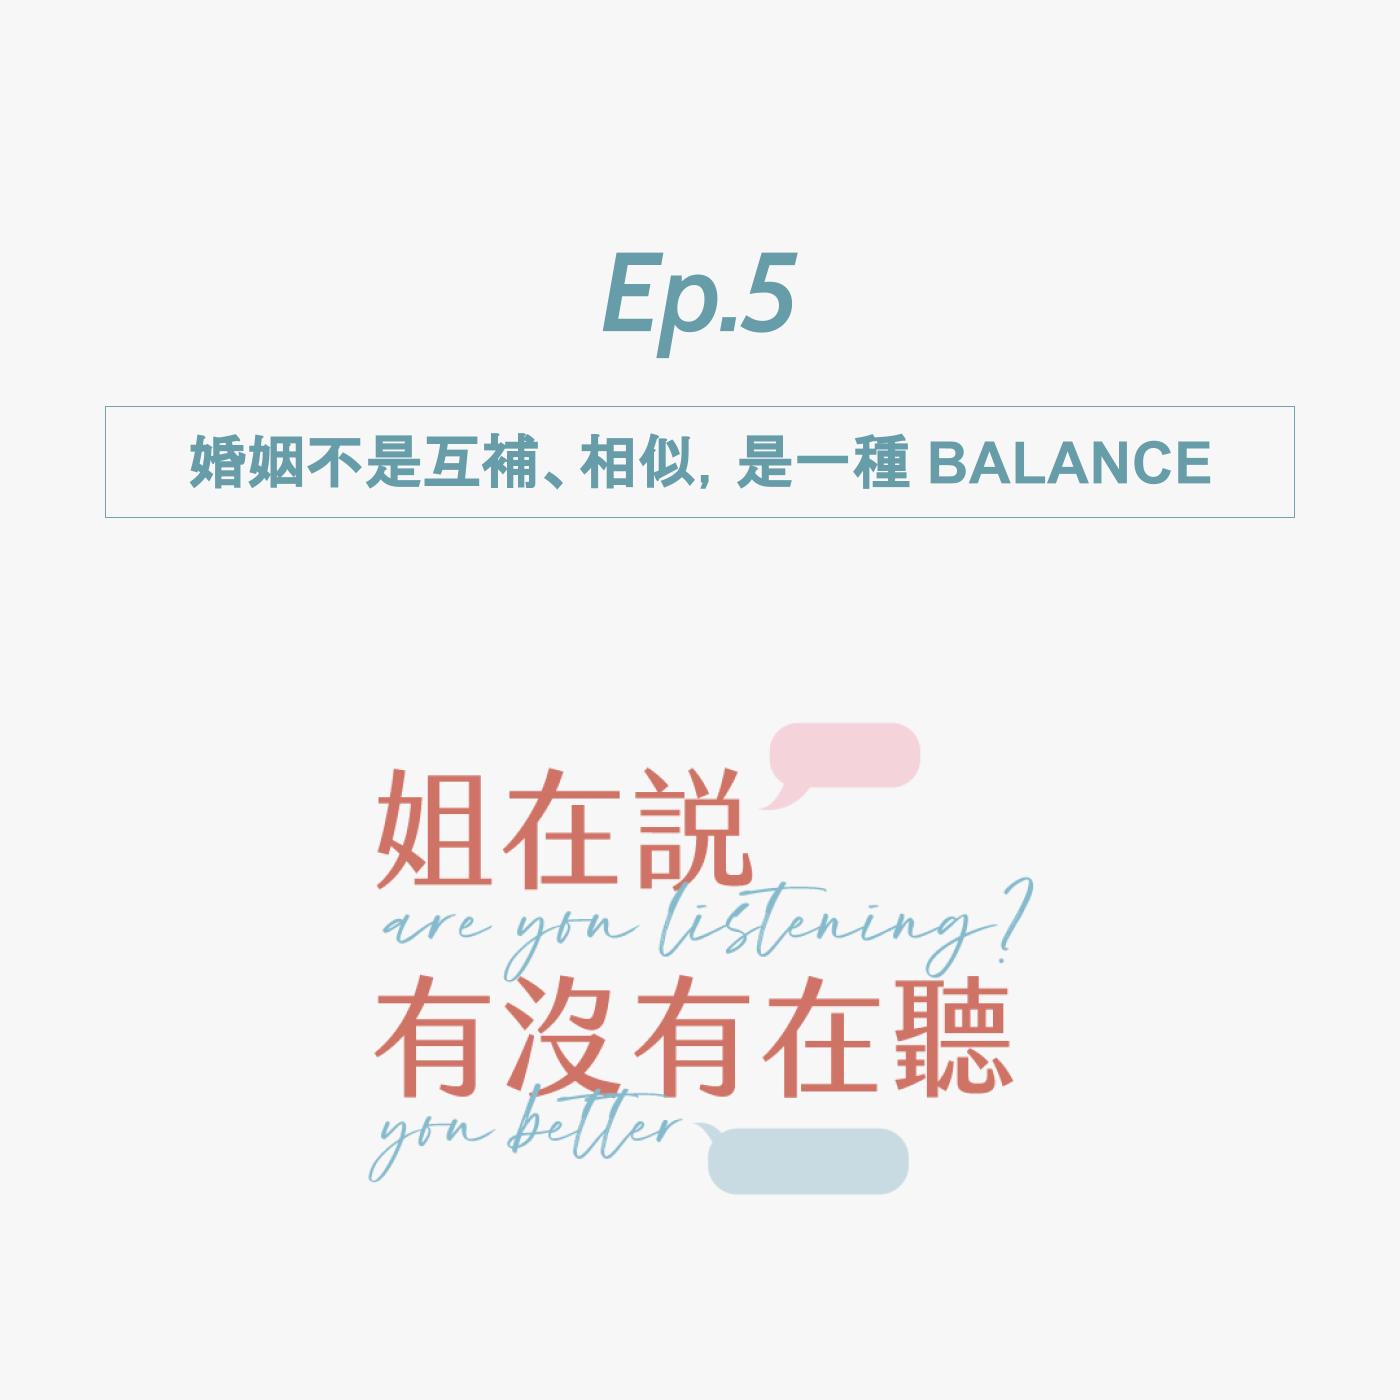 Ep.5【婚姻不是互補、相似,是一種 BALANCE】